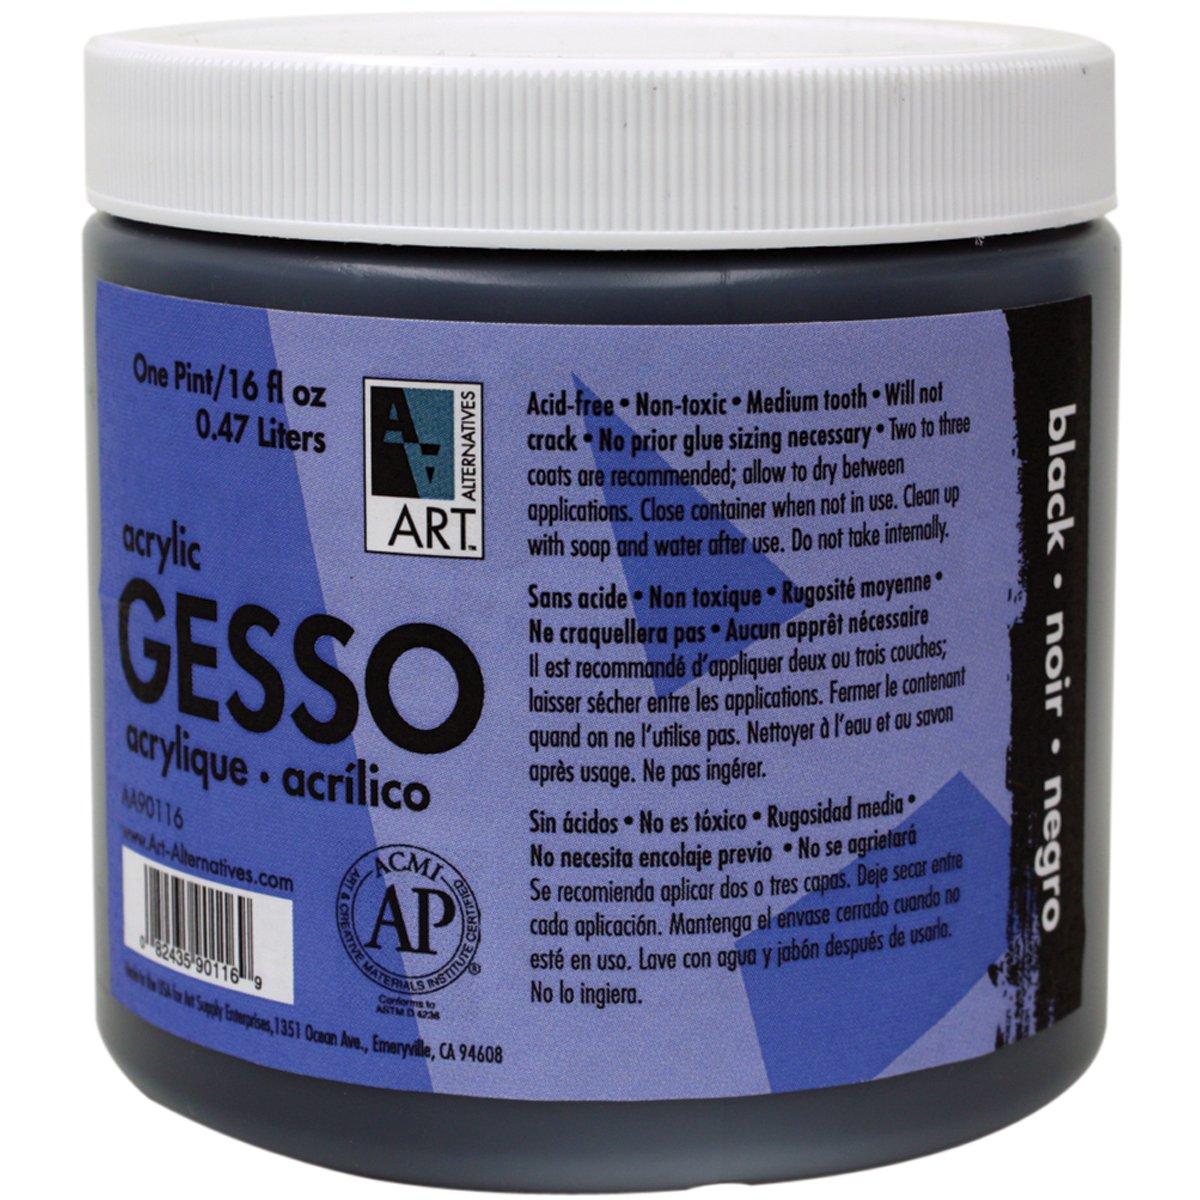 Art Alternatives Black Acrylic Gesso - 16oz Jar,1-Pack by Art Alternatives